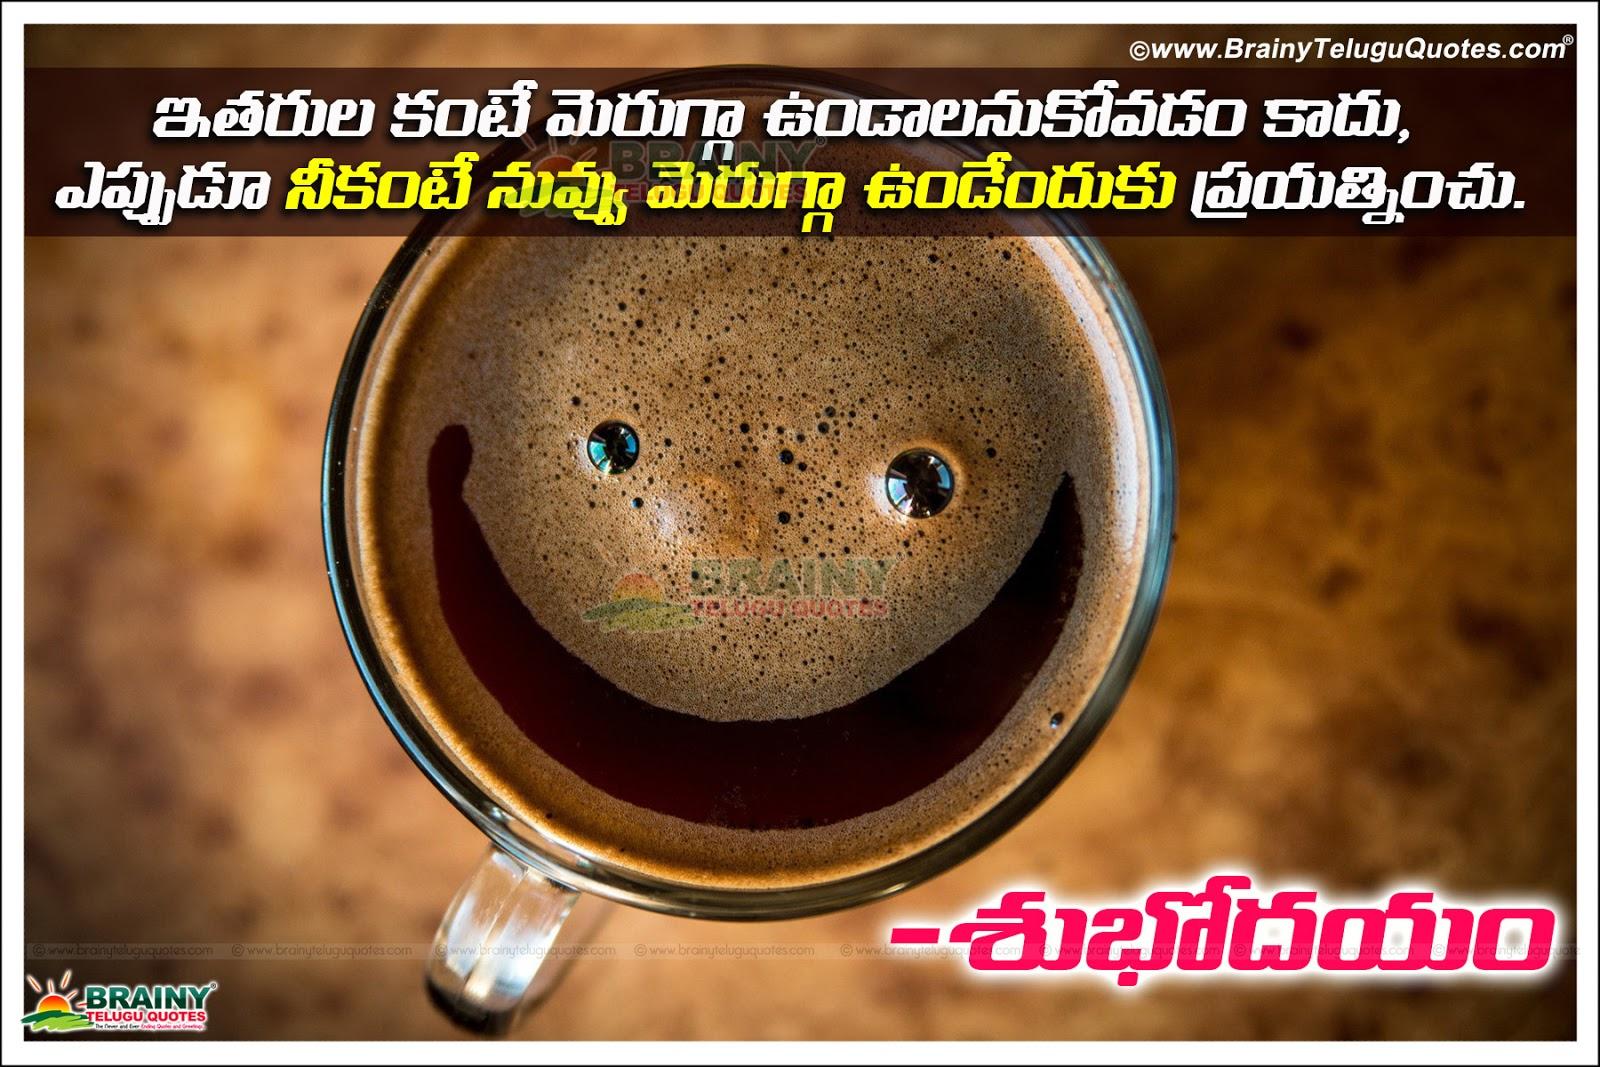 Telugu good morning greetings with secret of life success with telugu good morning greetings with secret of life success with coffee smile quotes kristyandbryce Images